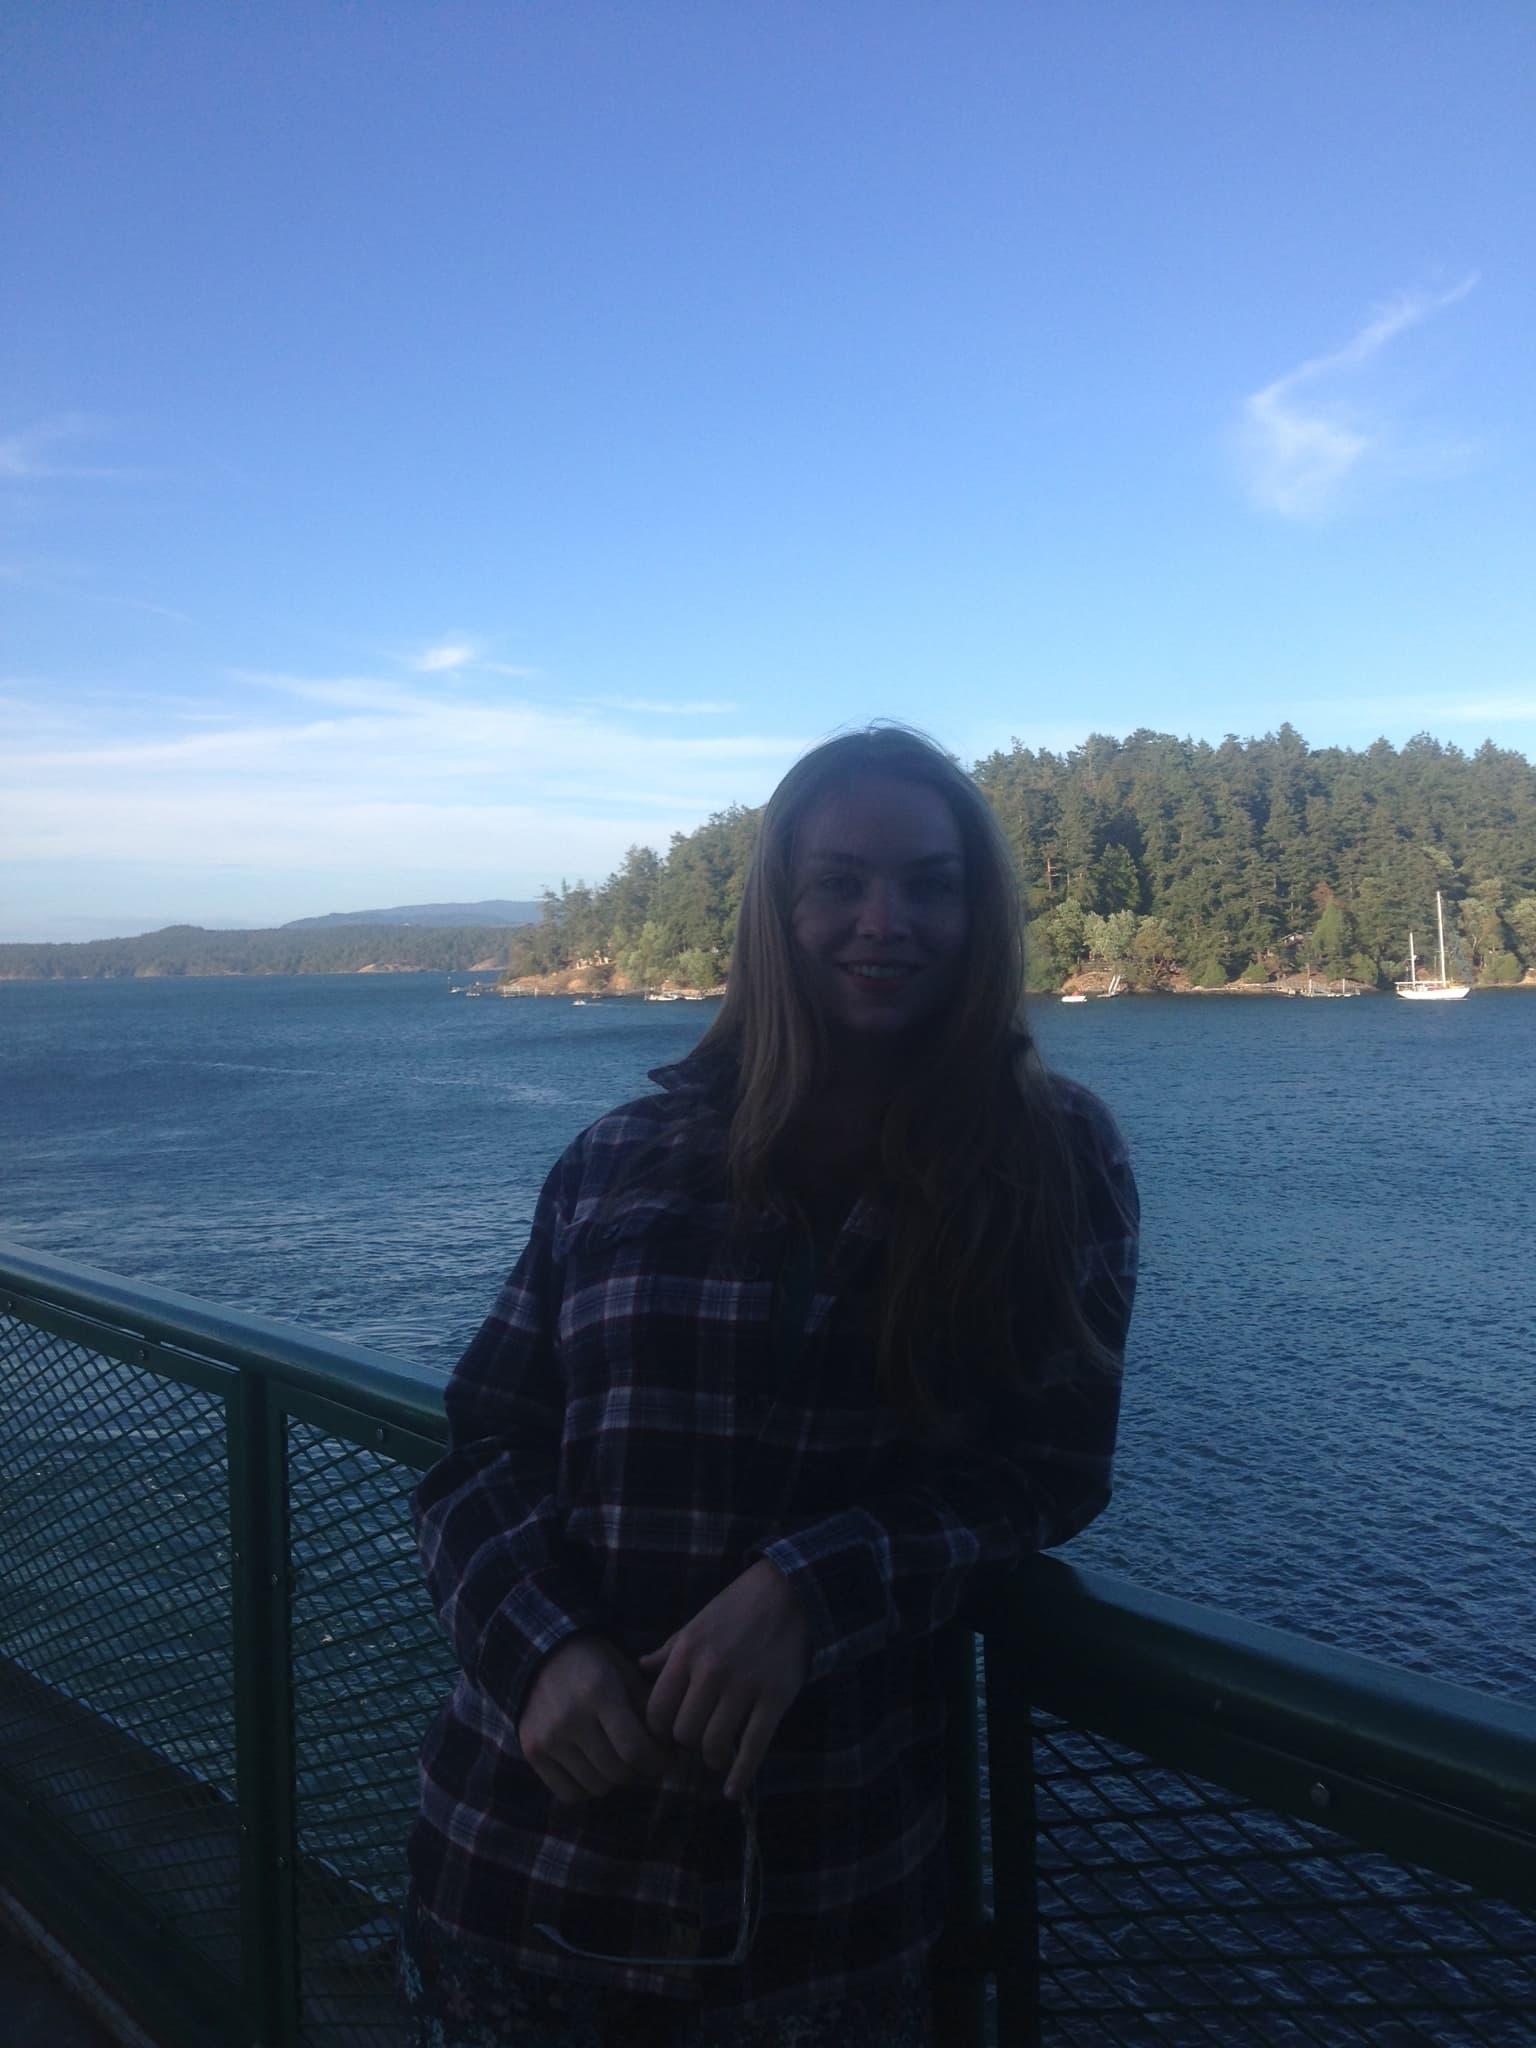 - Somewhere in the San Juan Islands in Washington State, 2016.